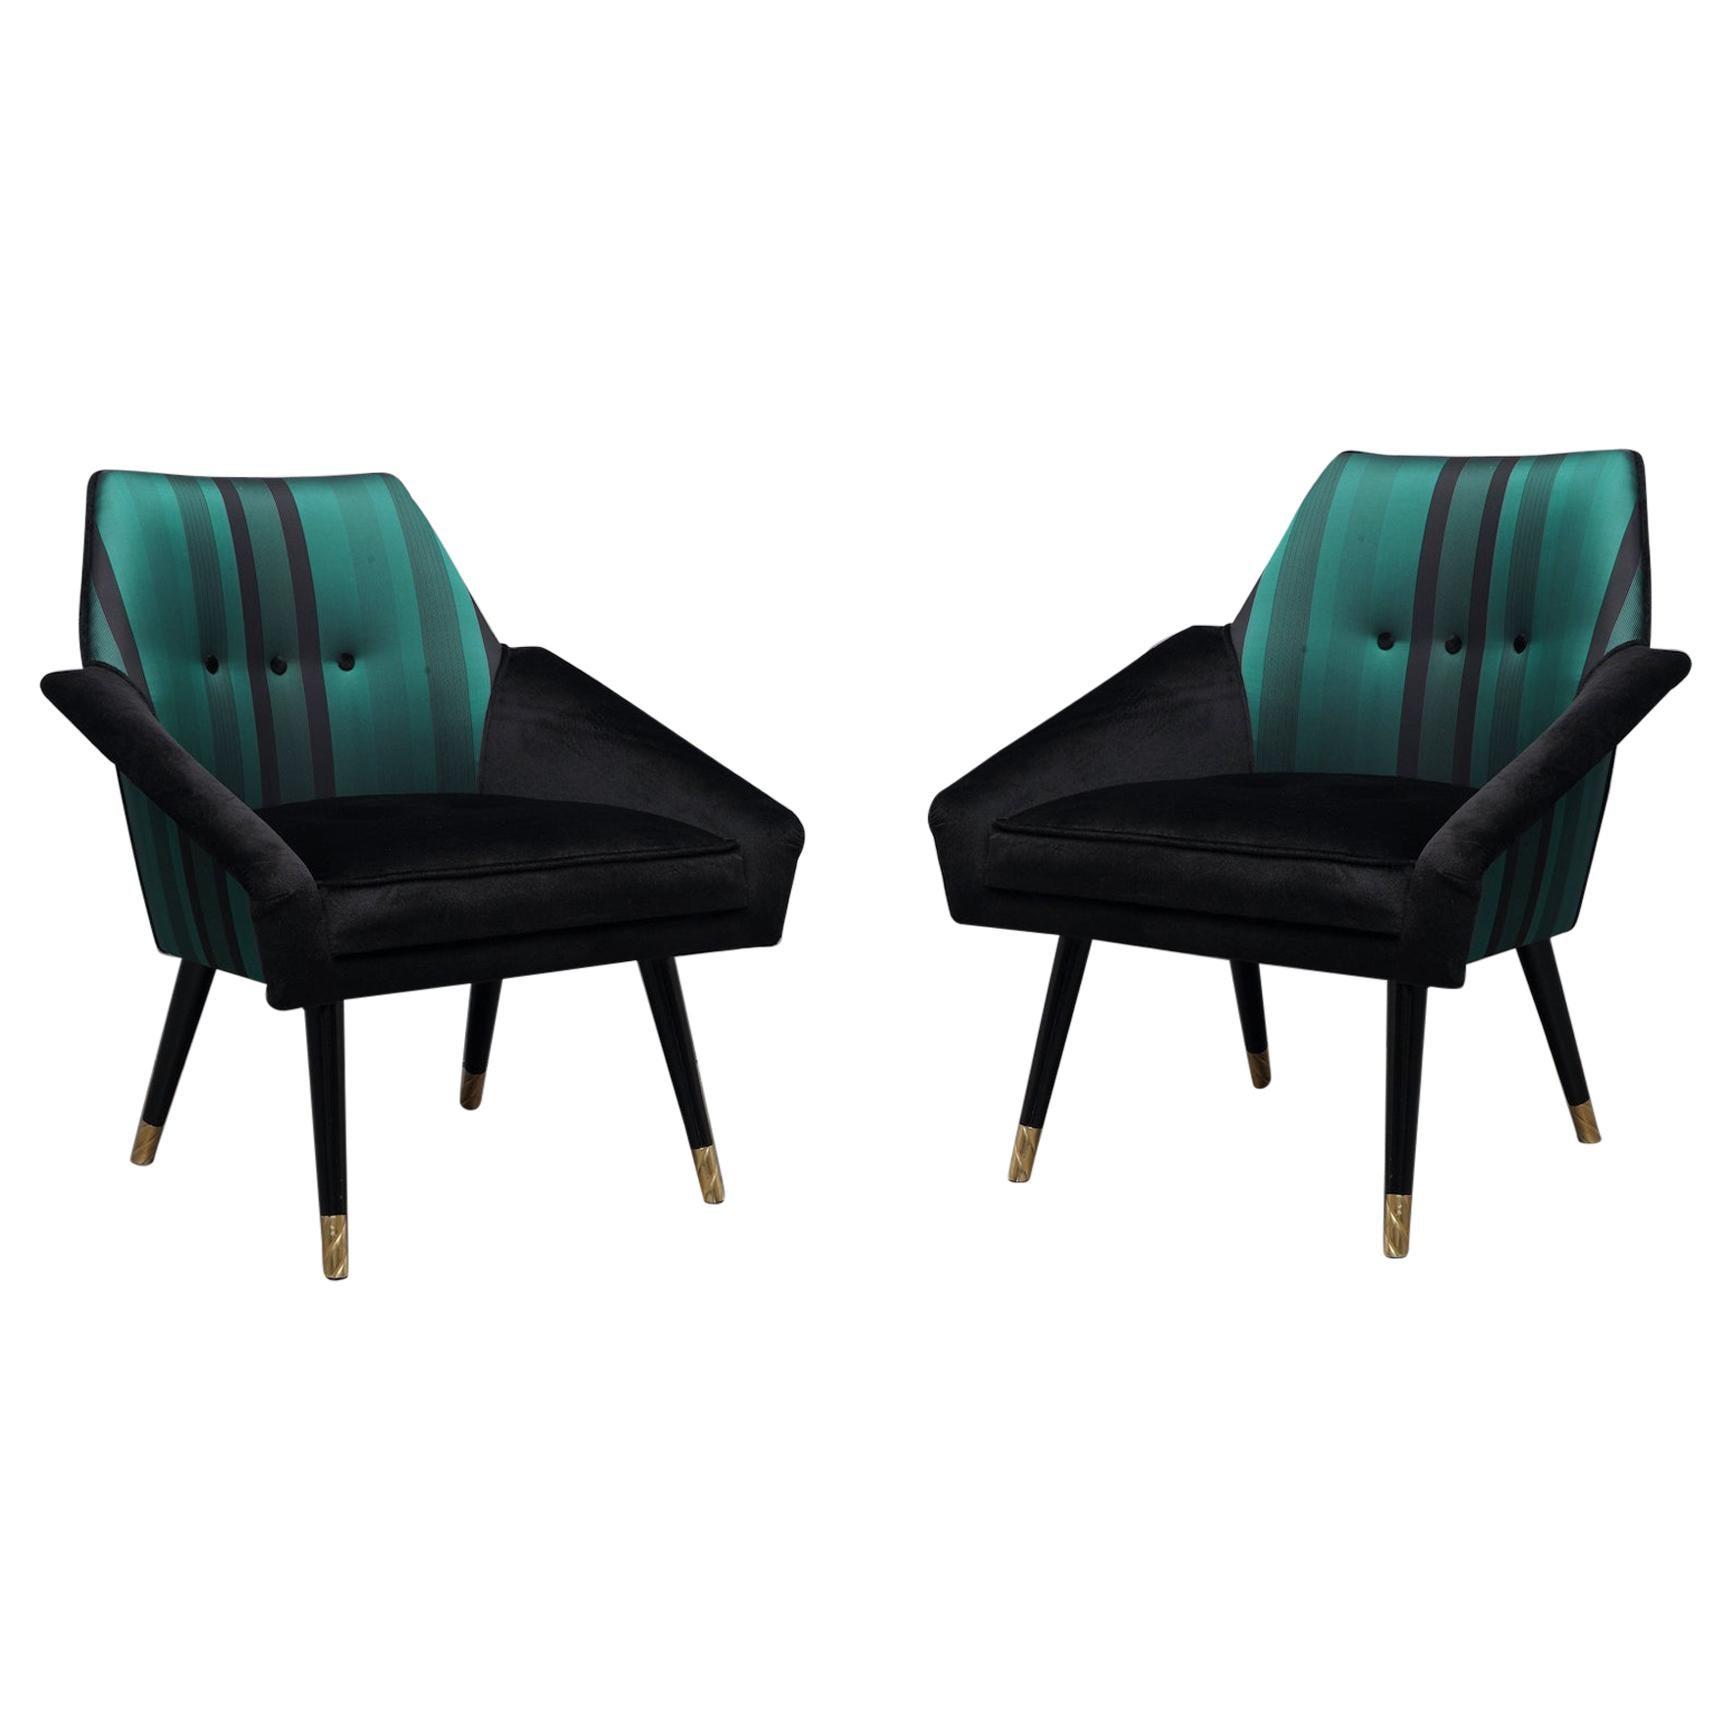 Pair of Midcentury Velvet Silk and Brass Armchairs, 1950